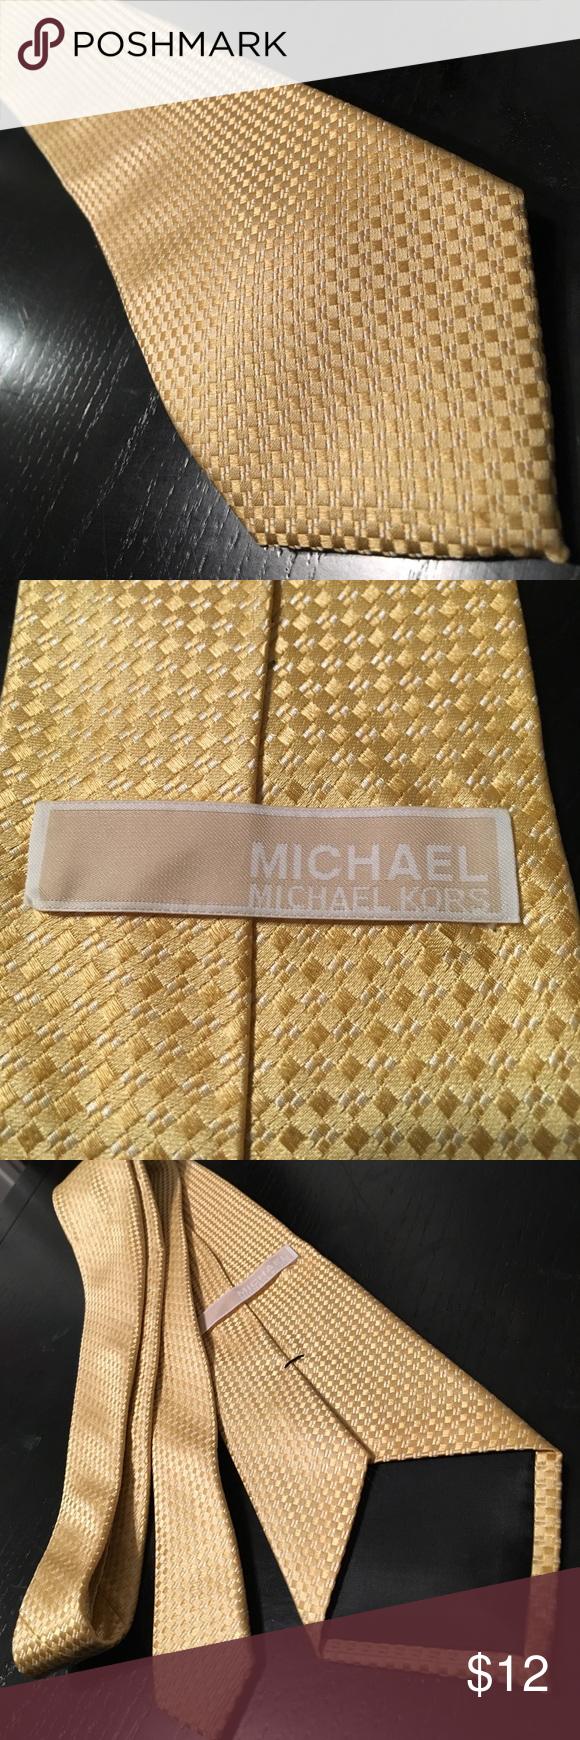 Mens Michael Kors Gold Tie Michael Kors Mens Tie. 100% Silk In great condition. MICHAEL Michael Kors Accessories Ties